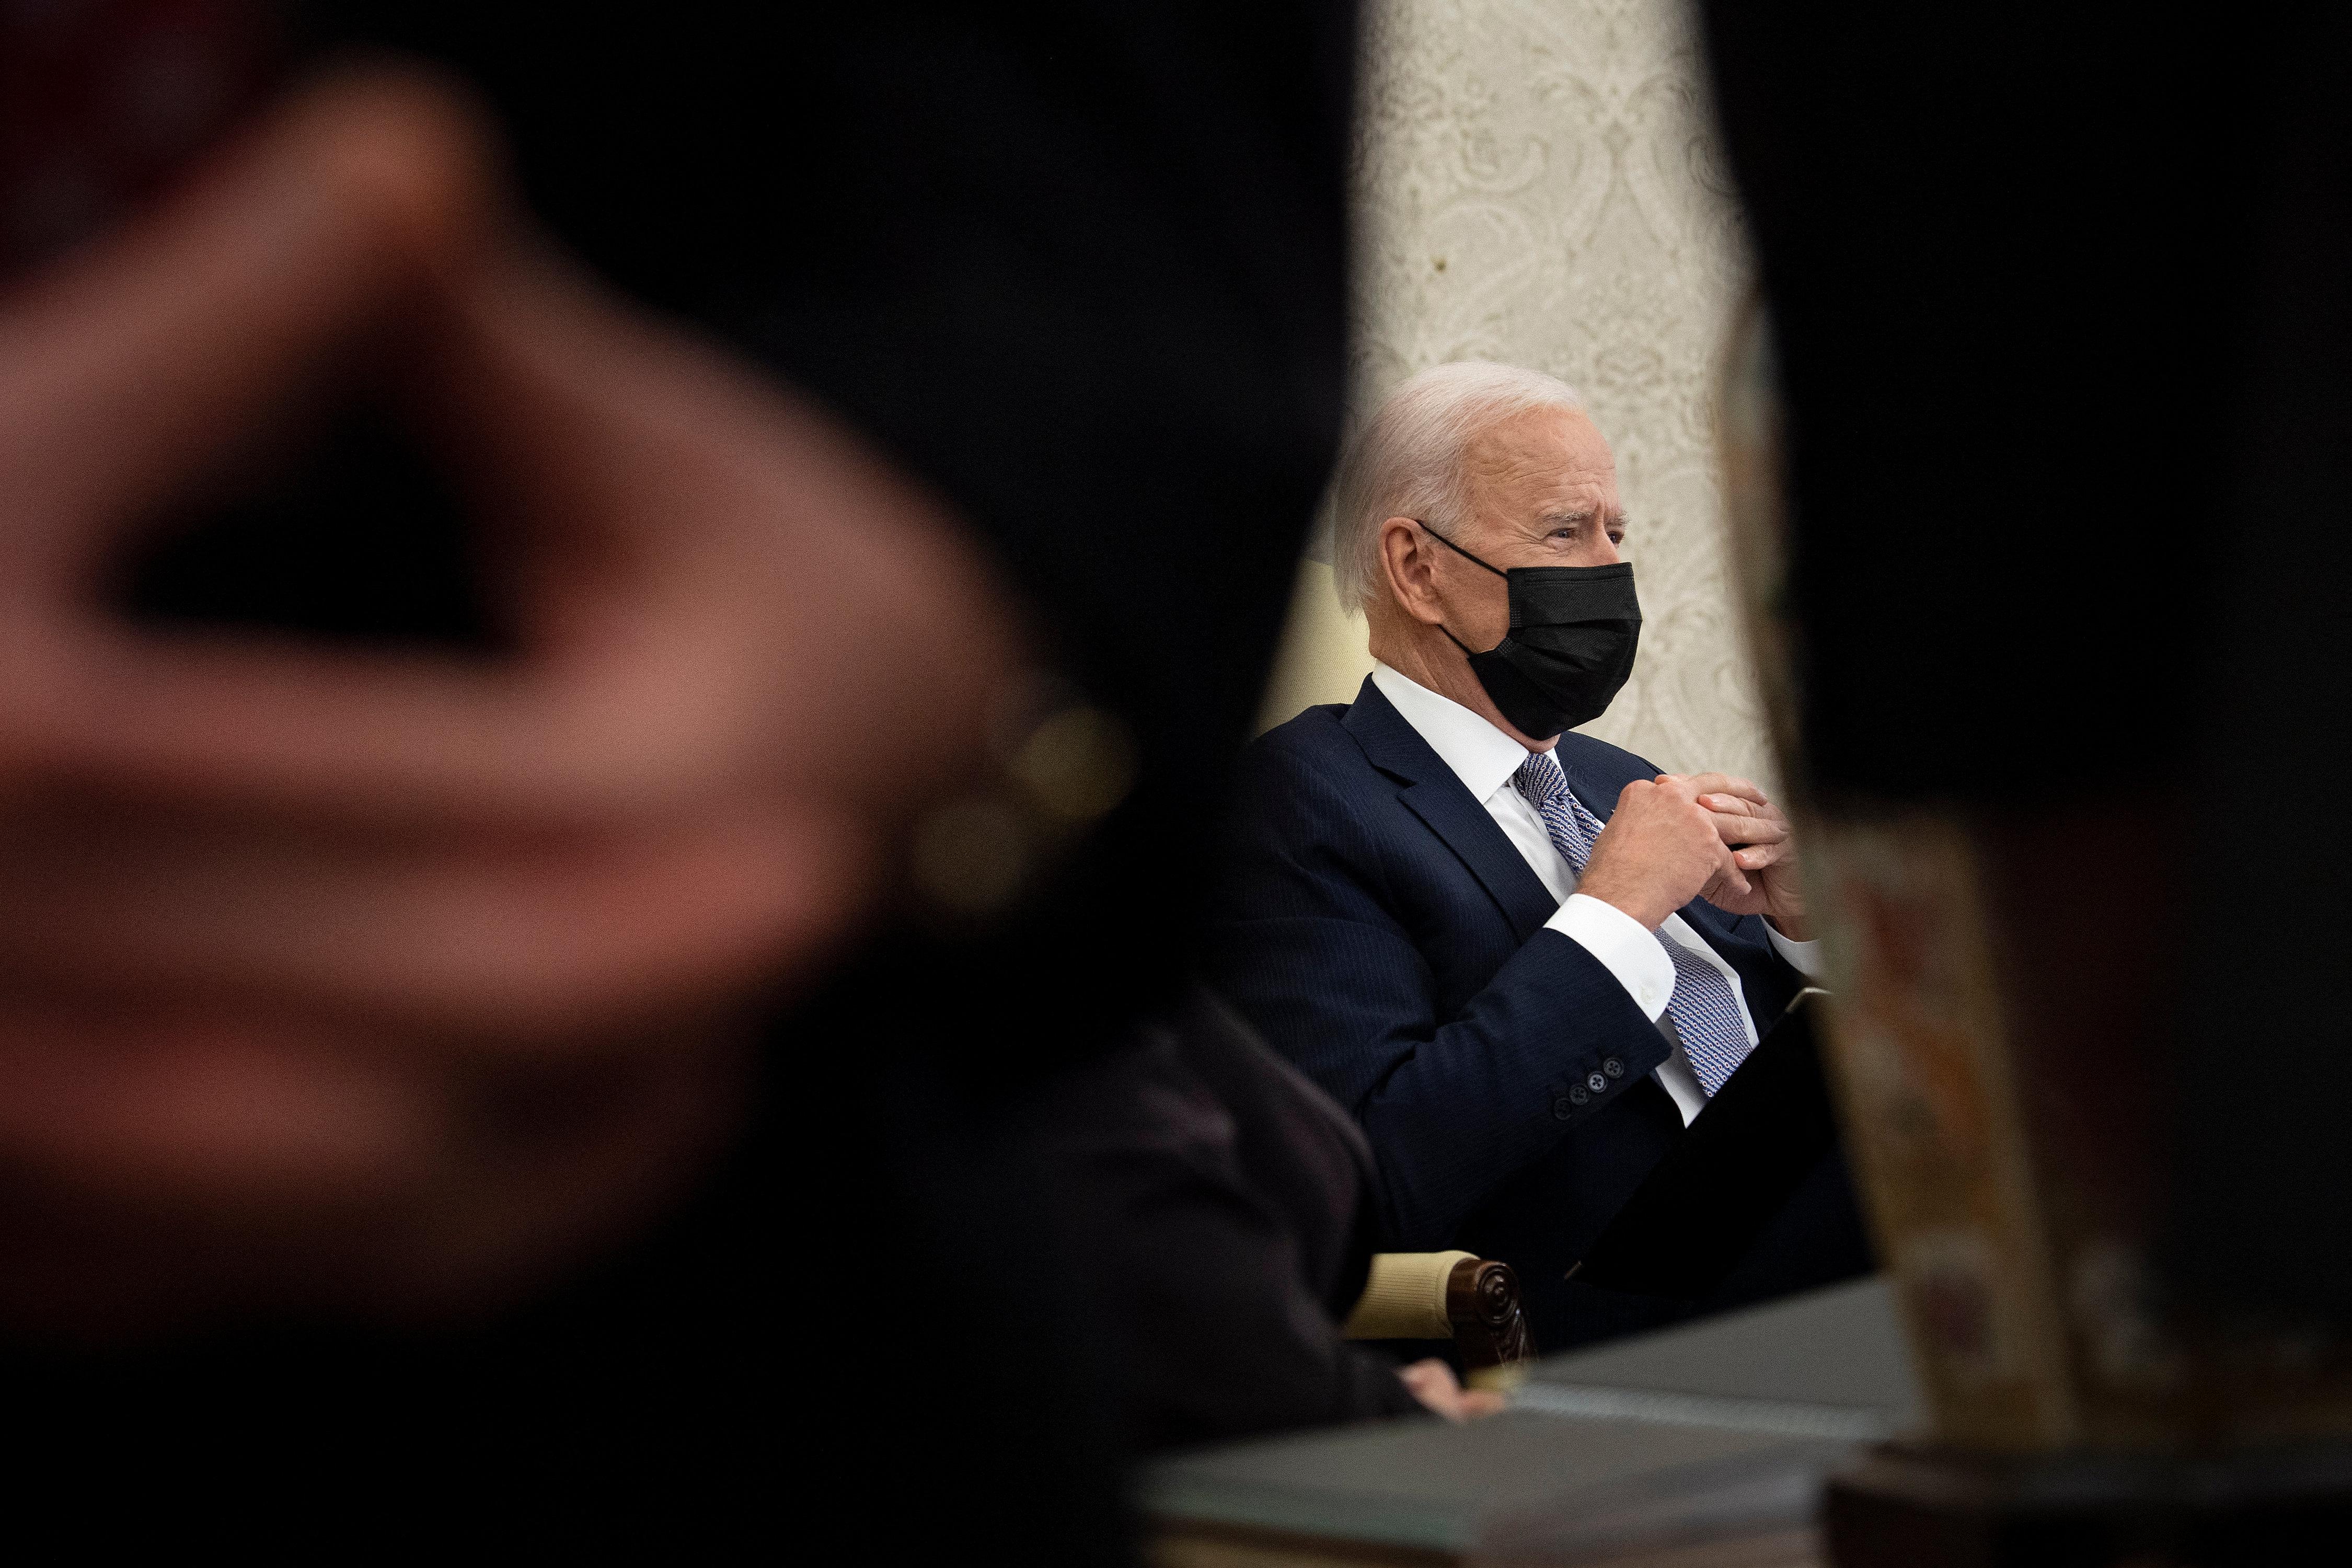 Biden Aims for Bipartisanship But Applies Stealthy Pressure